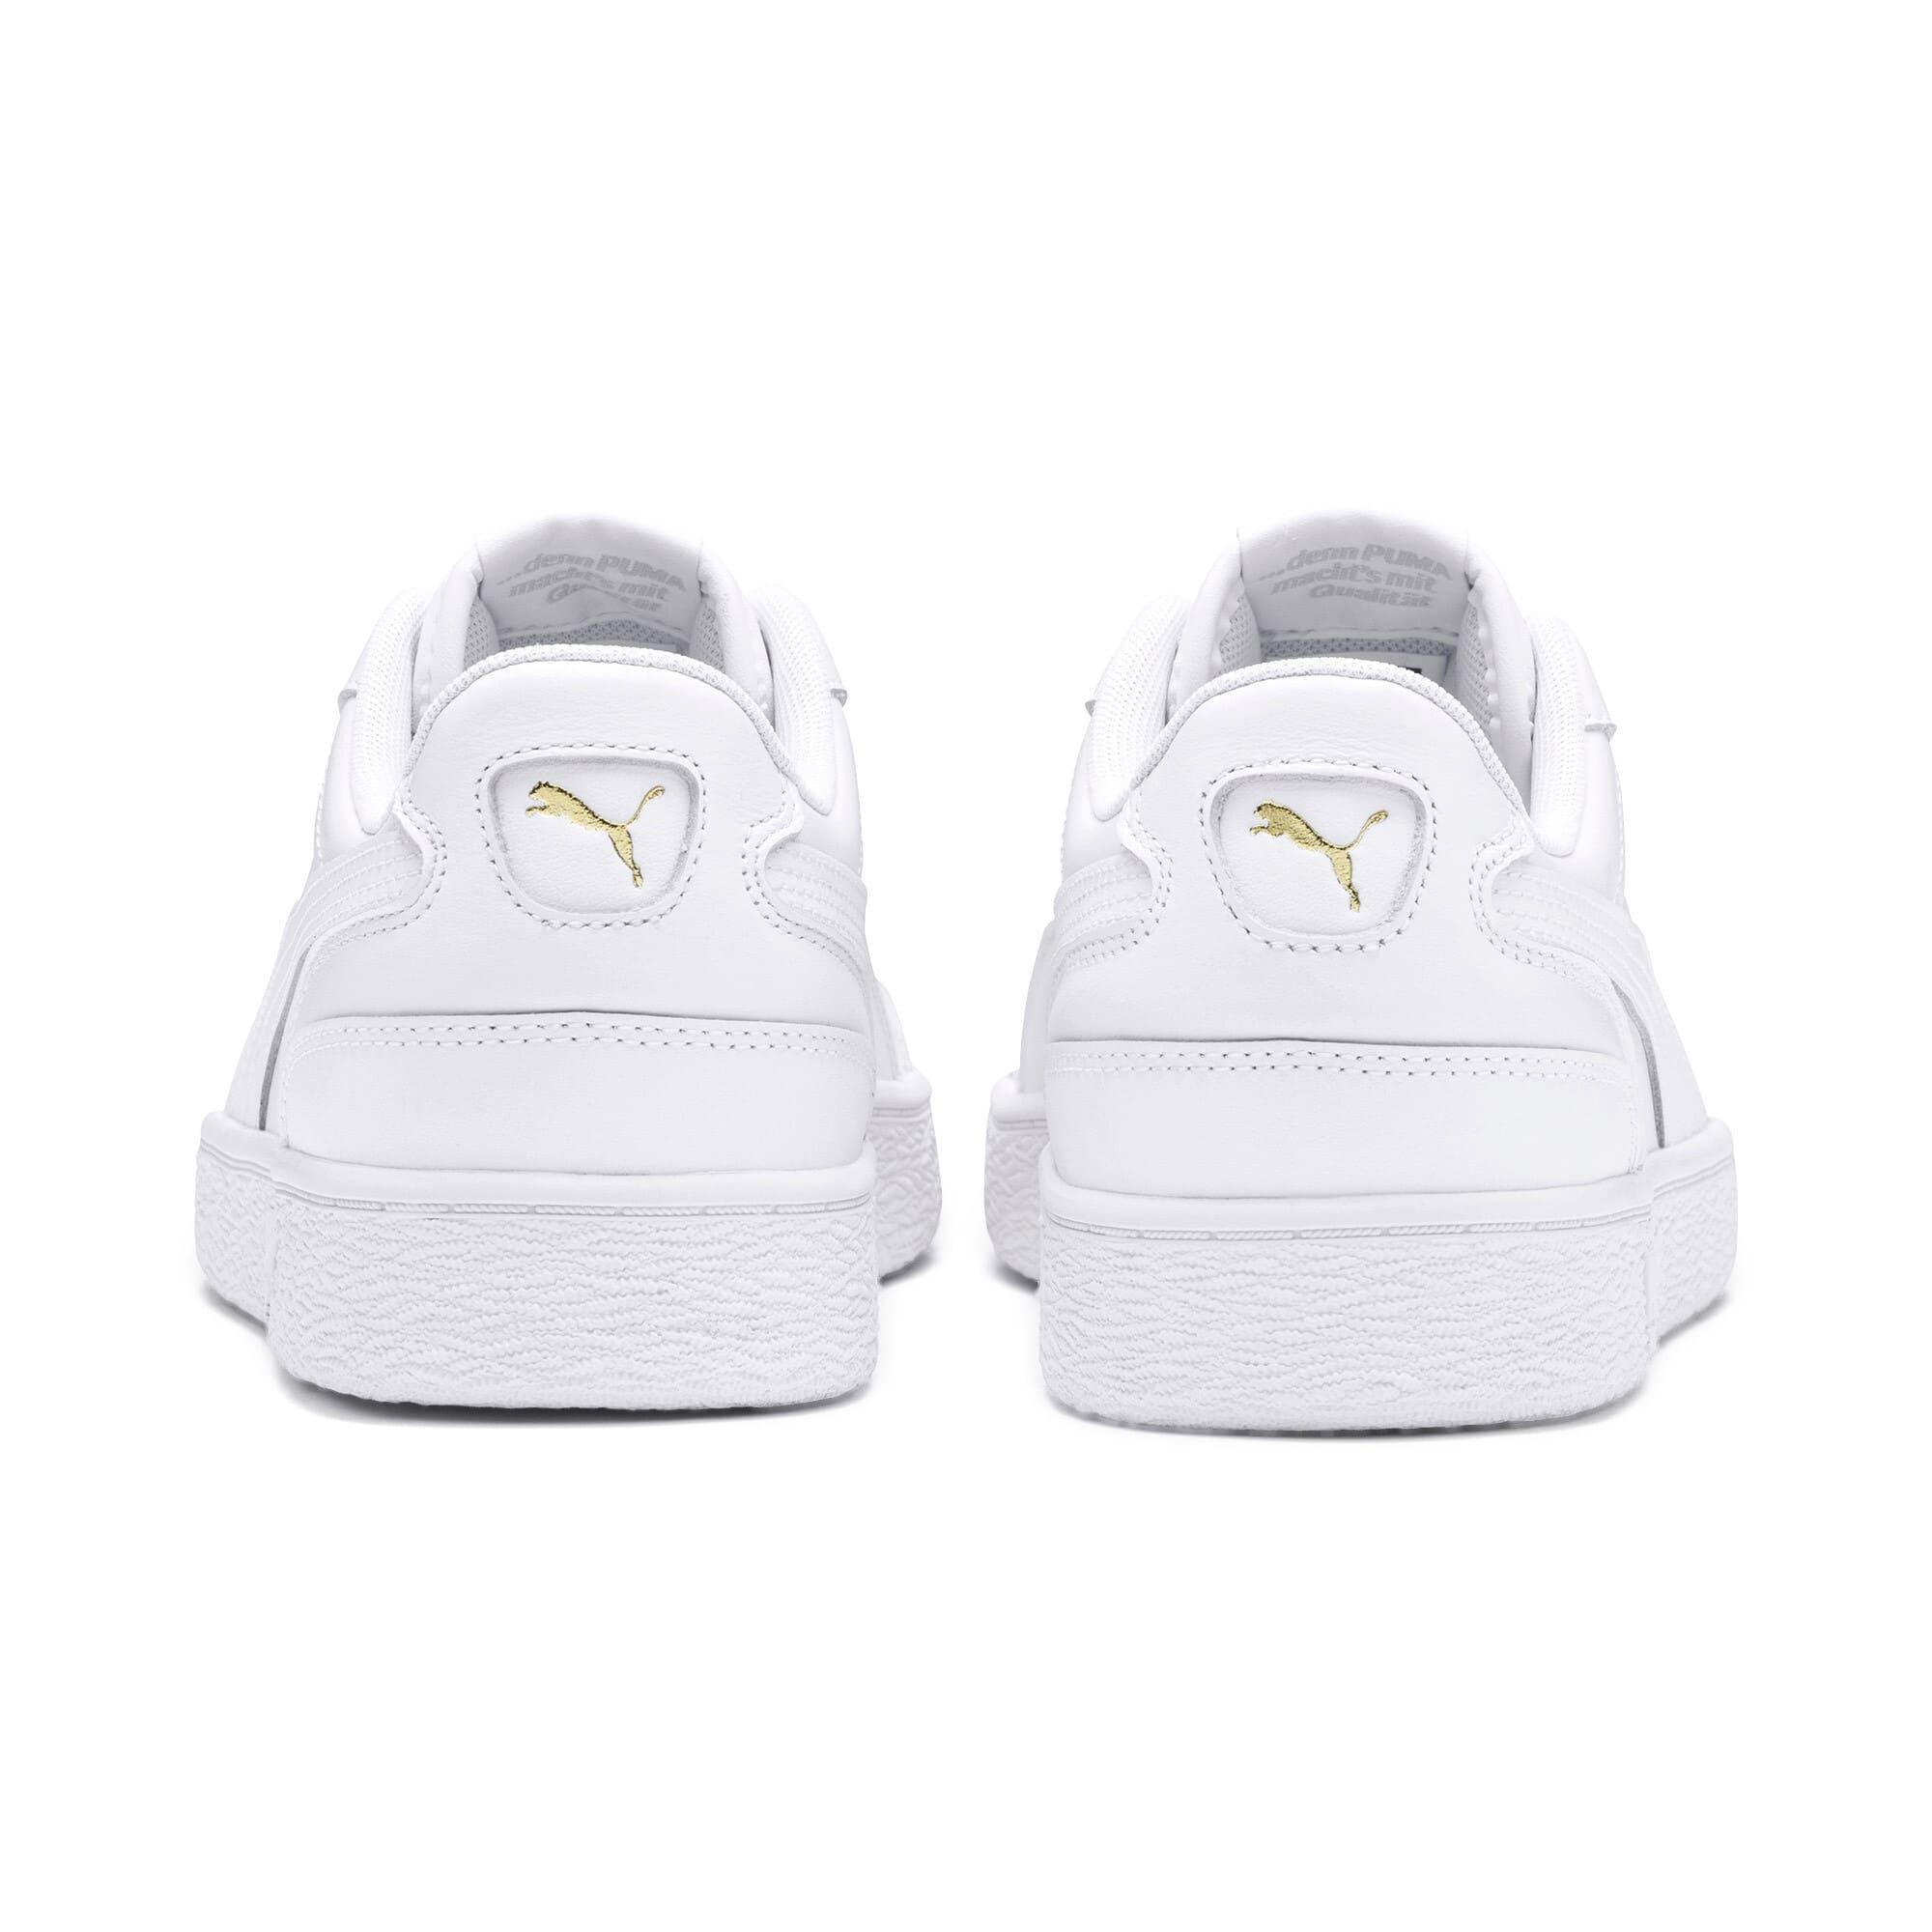 Thumbnail 4 of Ralph Sampson Lo Sneakers, Puma Wht-Puma Wht-Puma Wht, medium